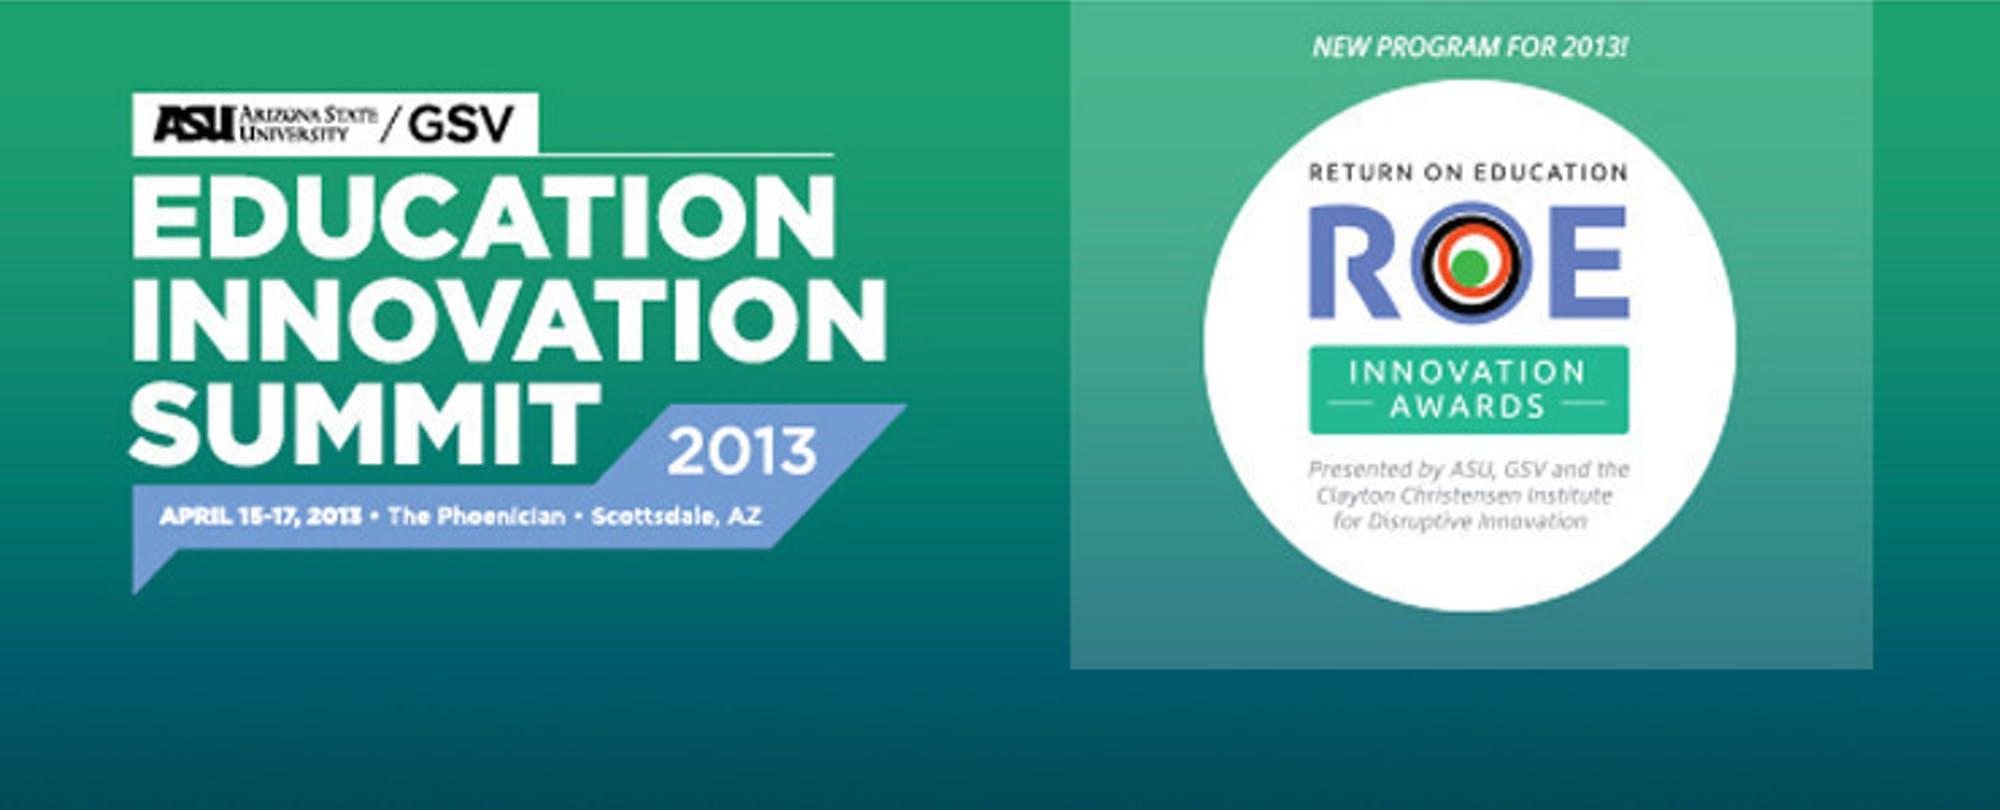 Education Innovation Summit Wrap Up